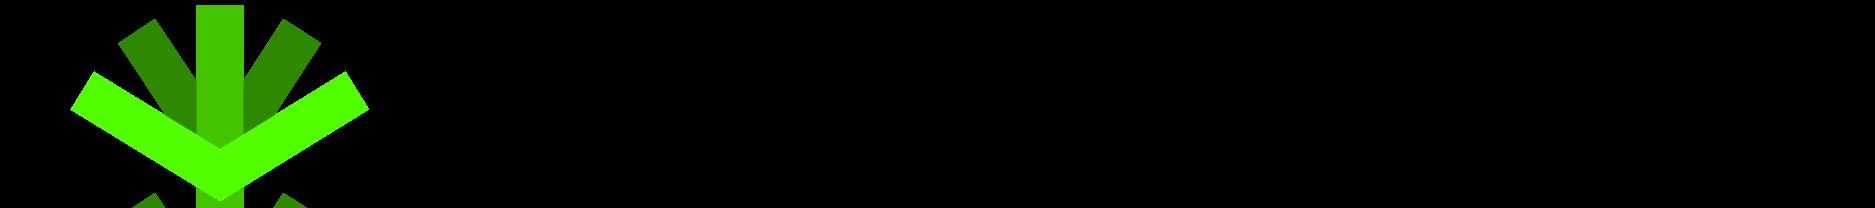 Logo Artyčok.tv